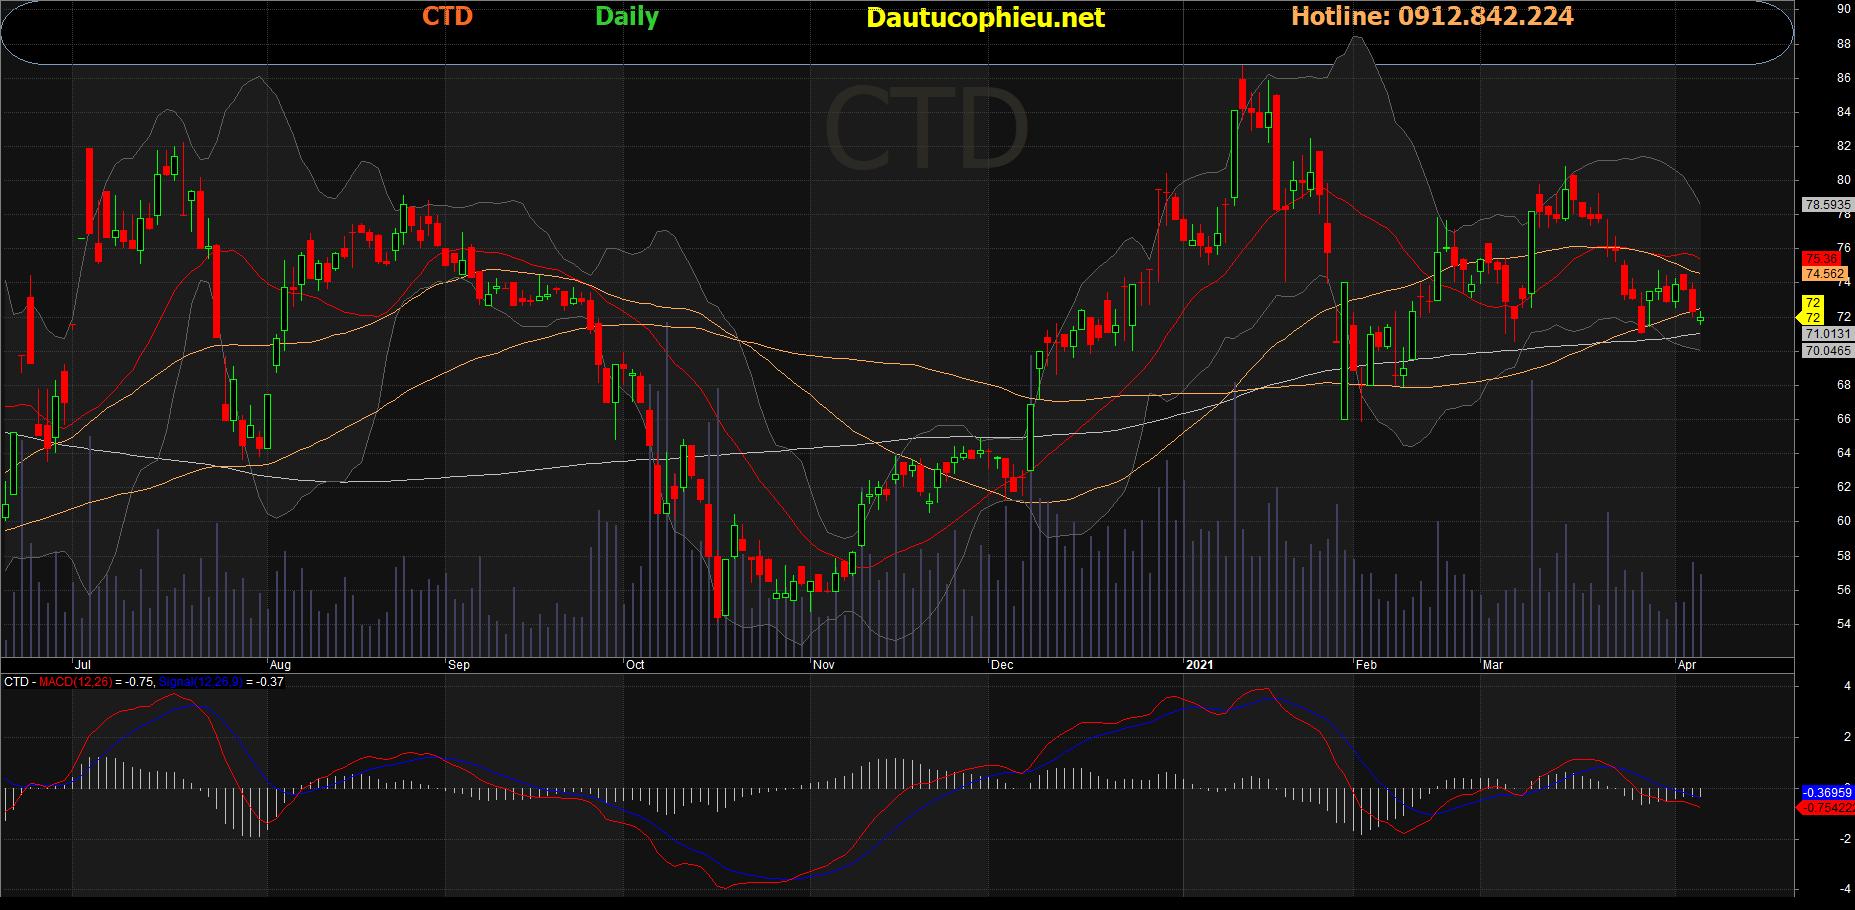 Cổ phiếu CTD